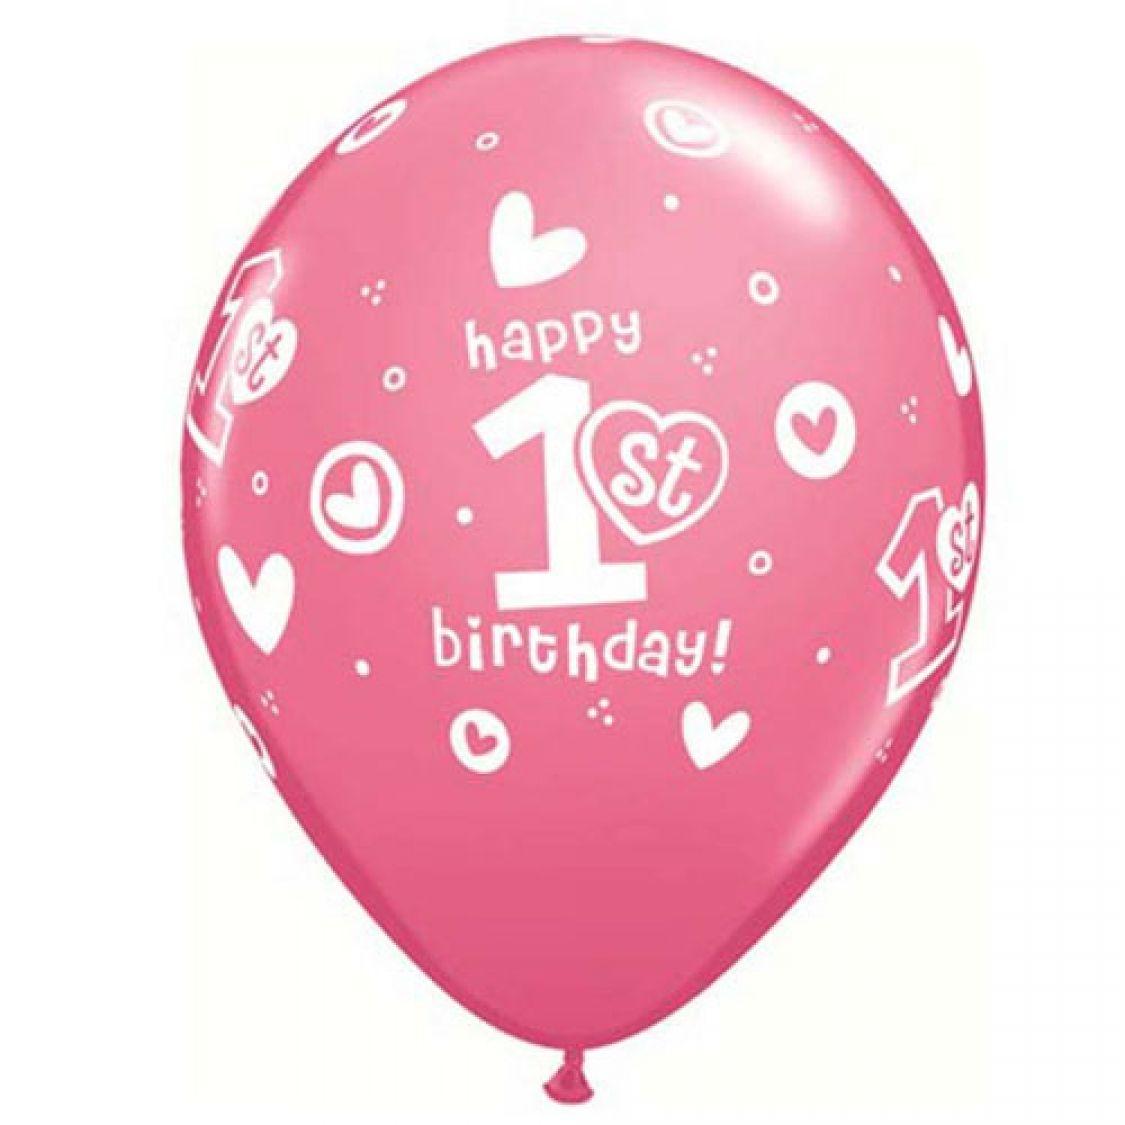 Ballon 1er anniversaire fille qualatex - Theme anniversaire 1 an fille ...